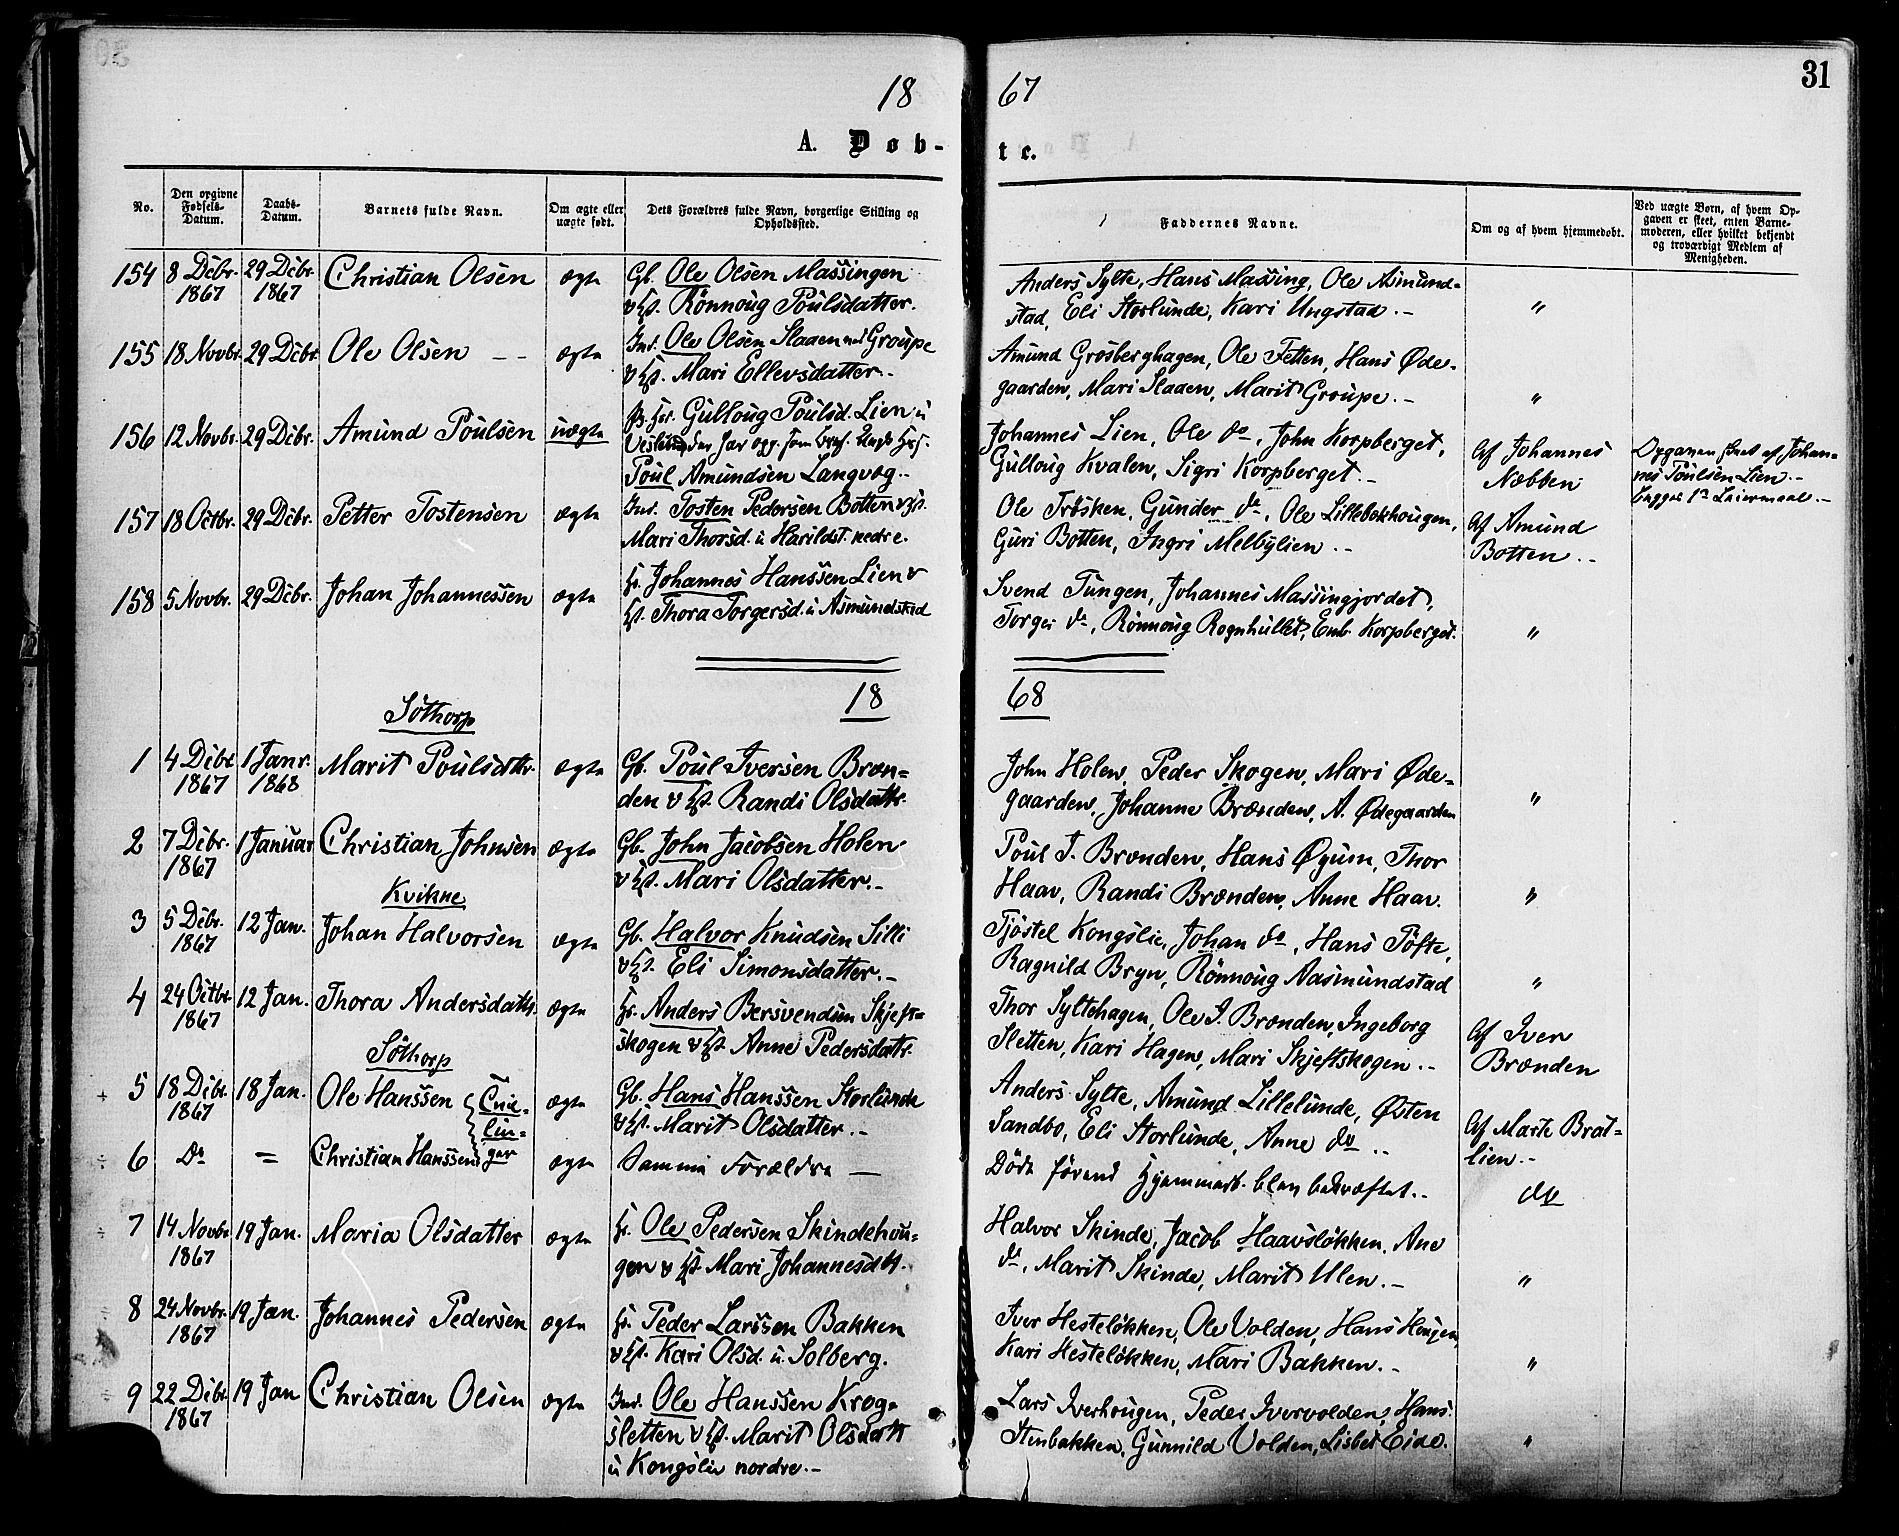 SAH, Nord-Fron prestekontor, Ministerialbok nr. 2, 1865-1883, s. 31